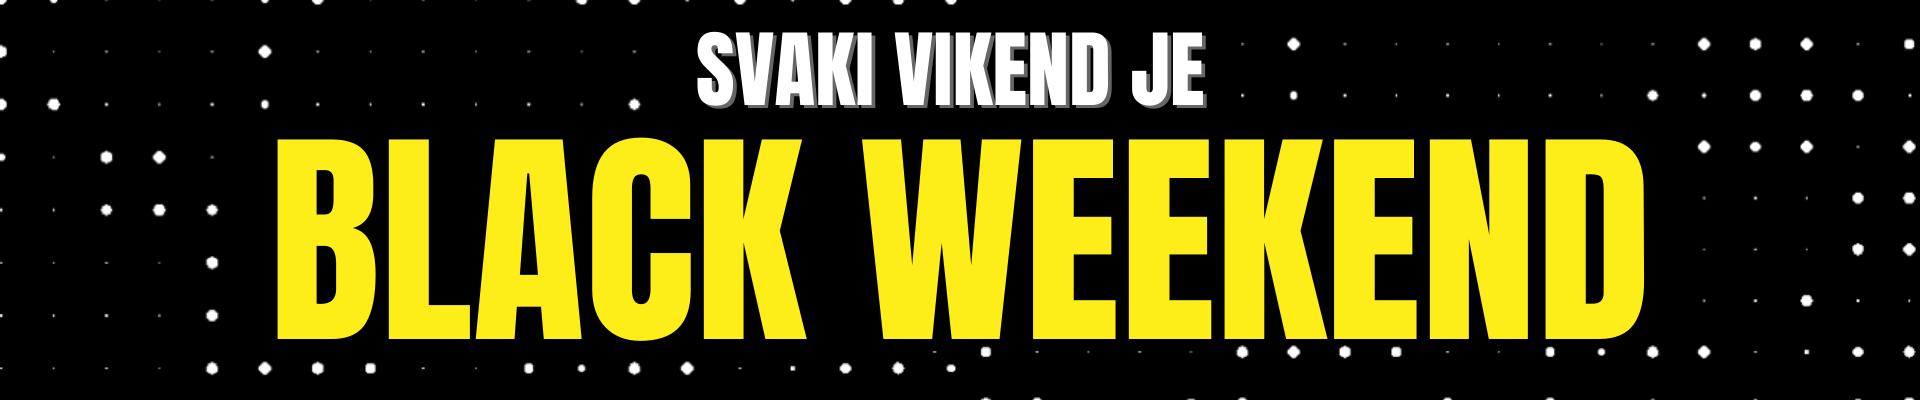 alles-black-friday-black-weekend-popust-akcija-snizenje-bosch-electrolux-dyson-gorenje